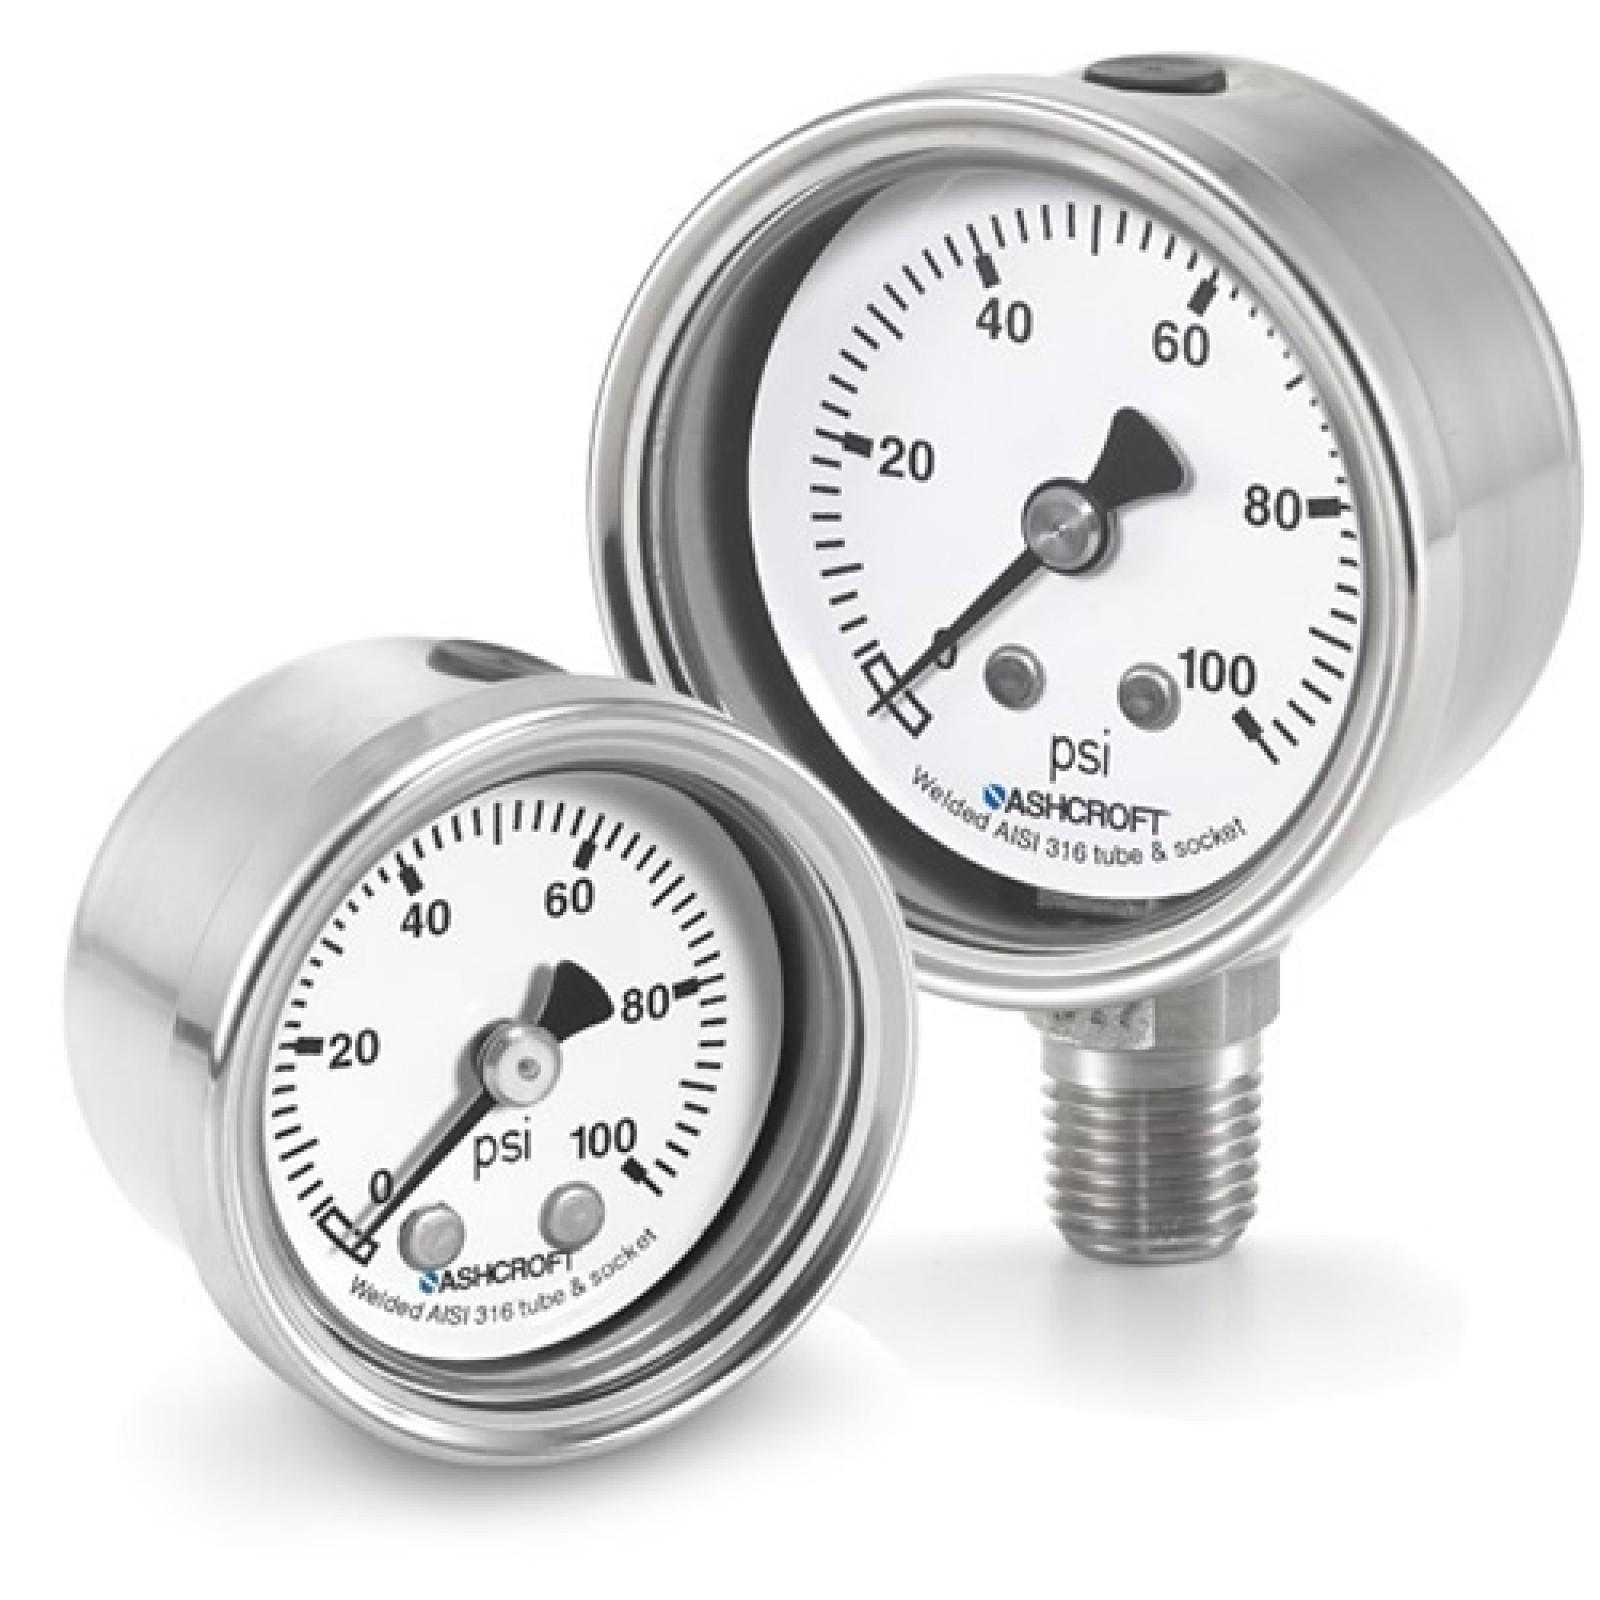 "63 1008S 02L XLL 400#/KP - Pressure Gauge, 63mm stainless 1/4"" NPT Lower conn & Case, Plus Performance 0/400 psi"